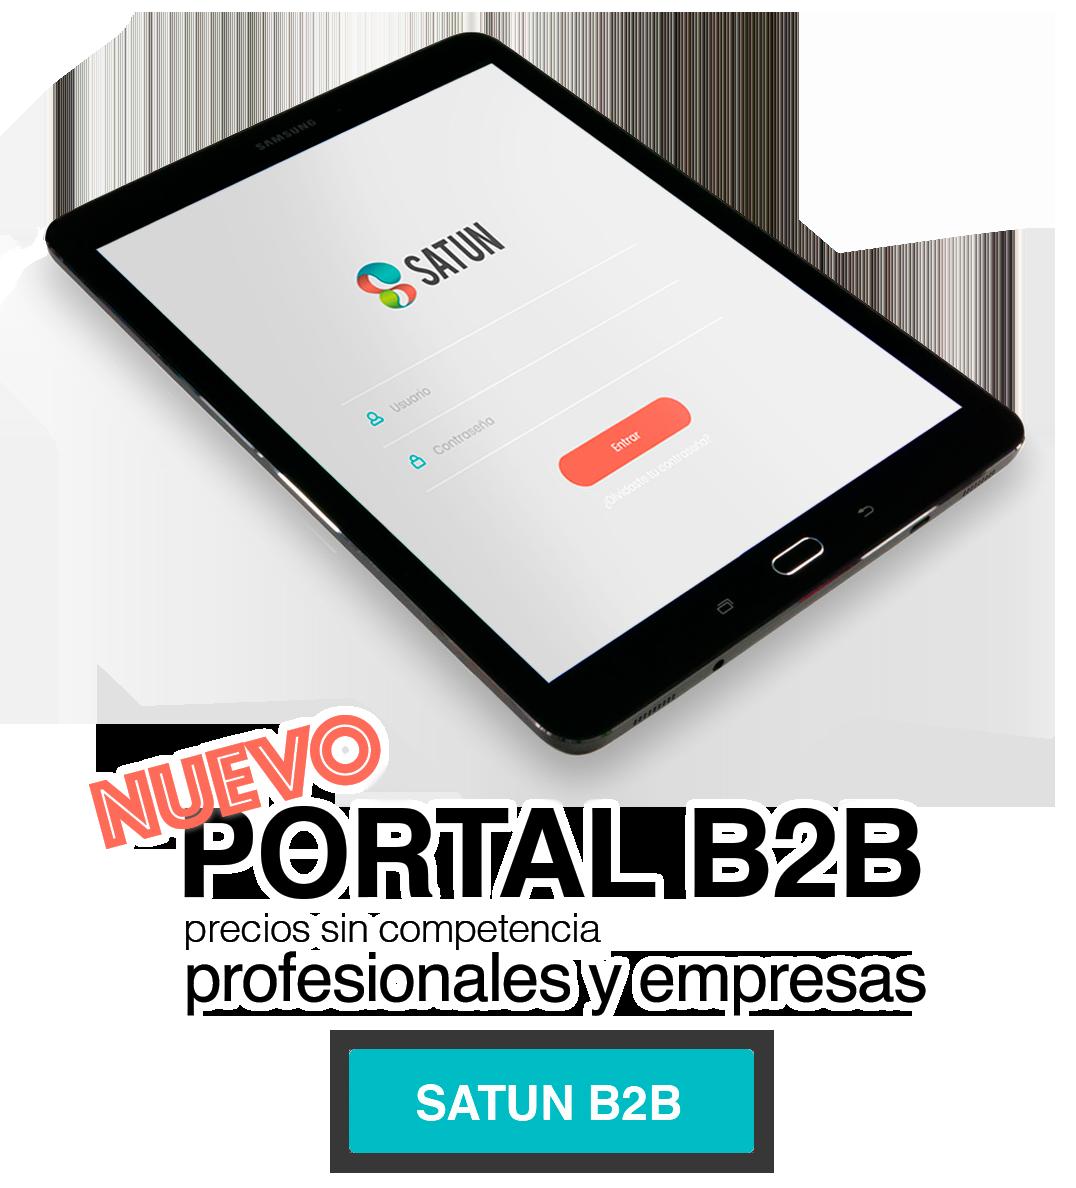 Portal B2B para profesionales